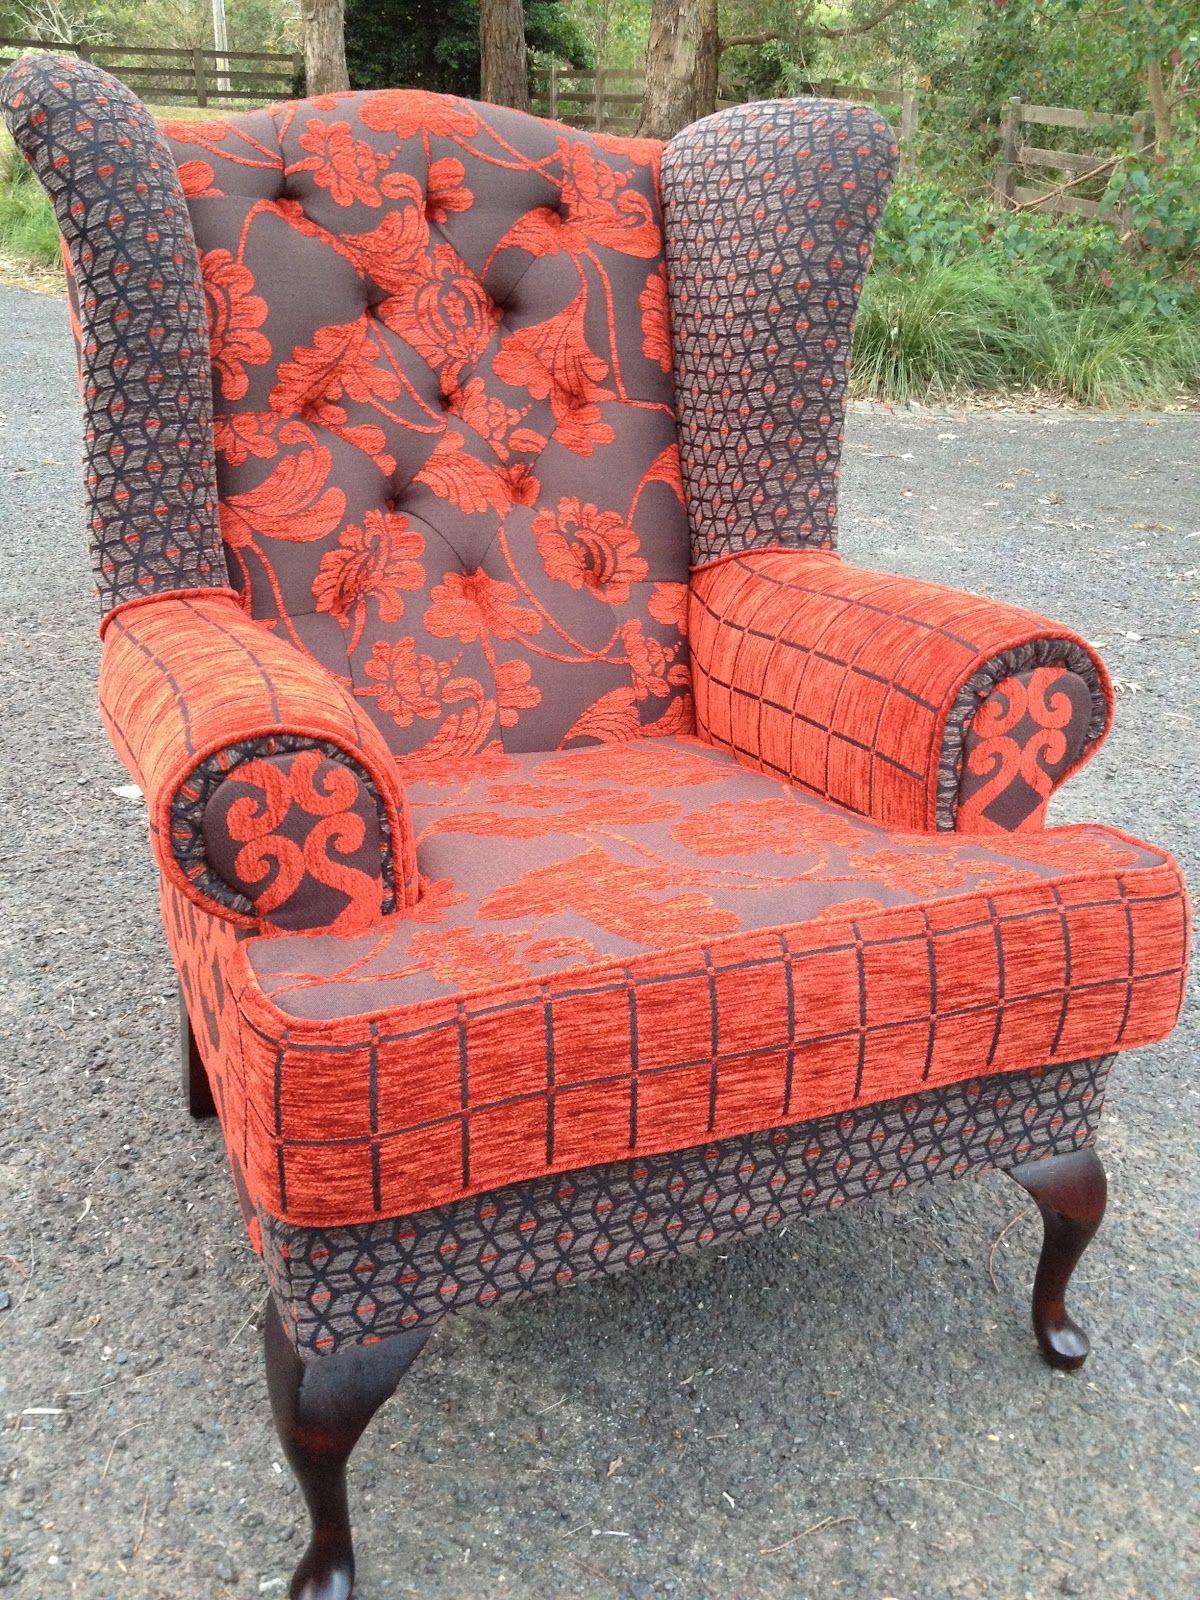 Piece Work Wingchair, In Warwick Fabrics Retrospect (40% Recycled Plastic  Content)